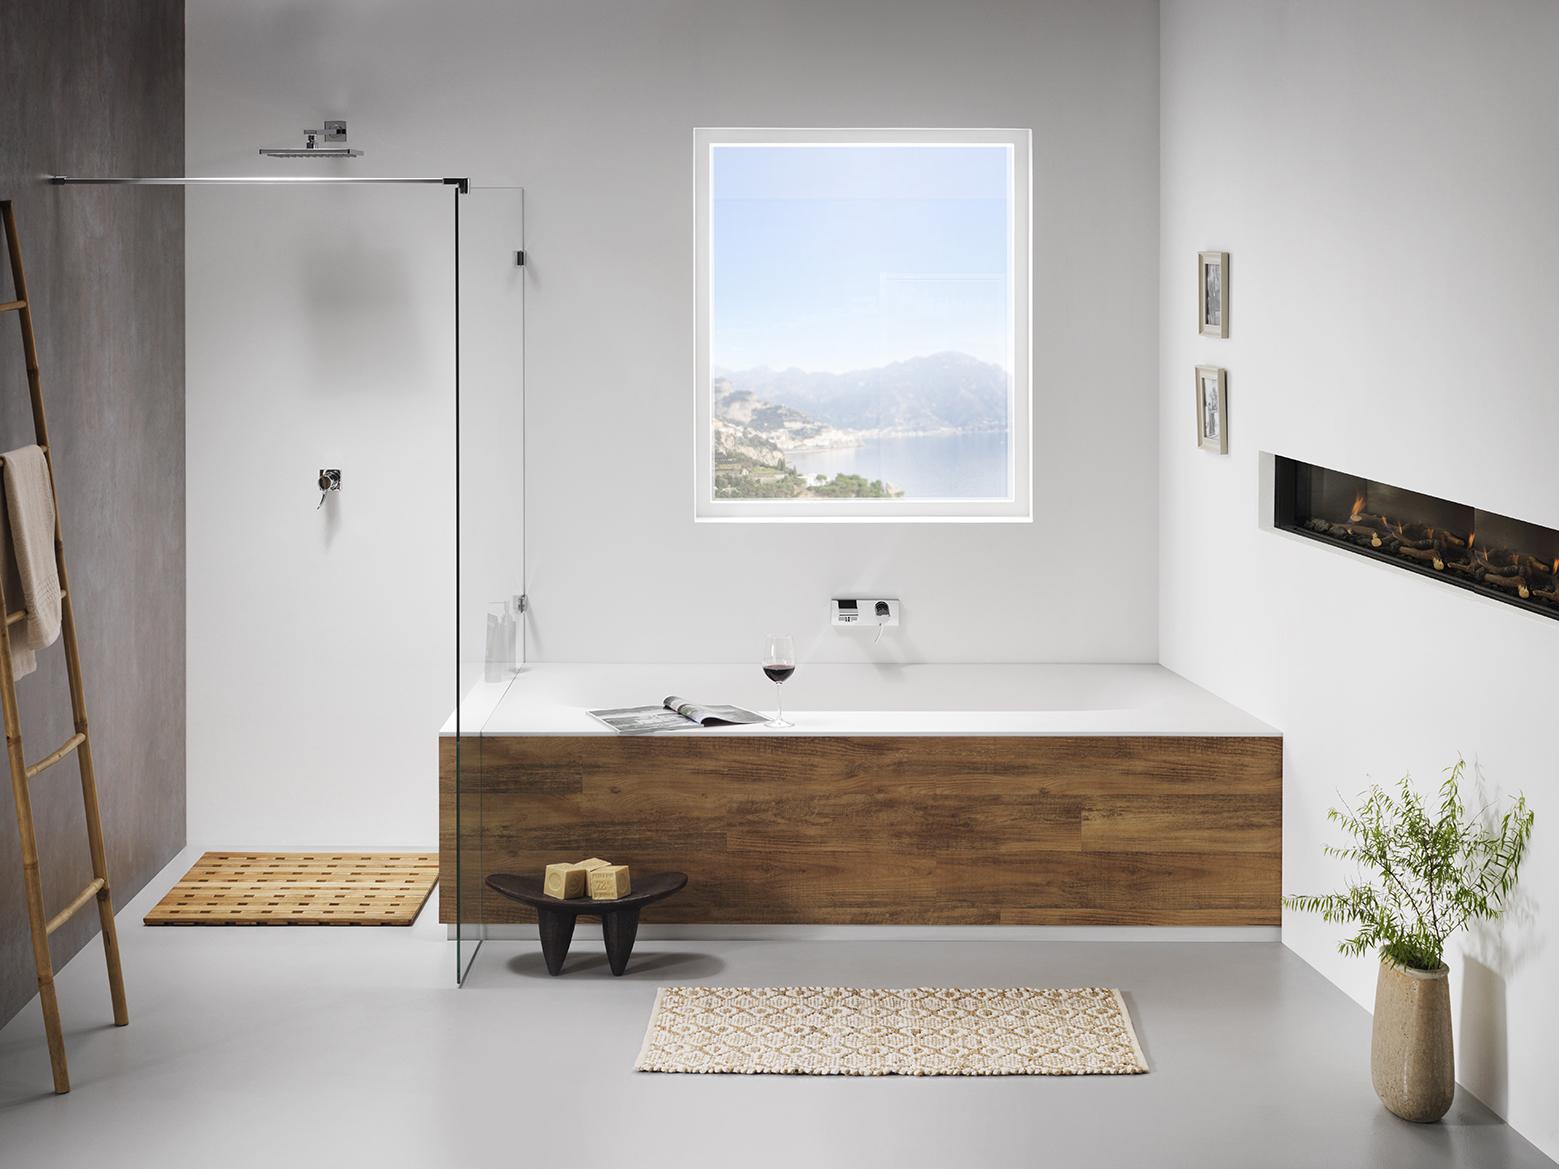 Badkamer Showroom Duiven : Sanitair rongen vof venray voor badkamers sanitair en tegels